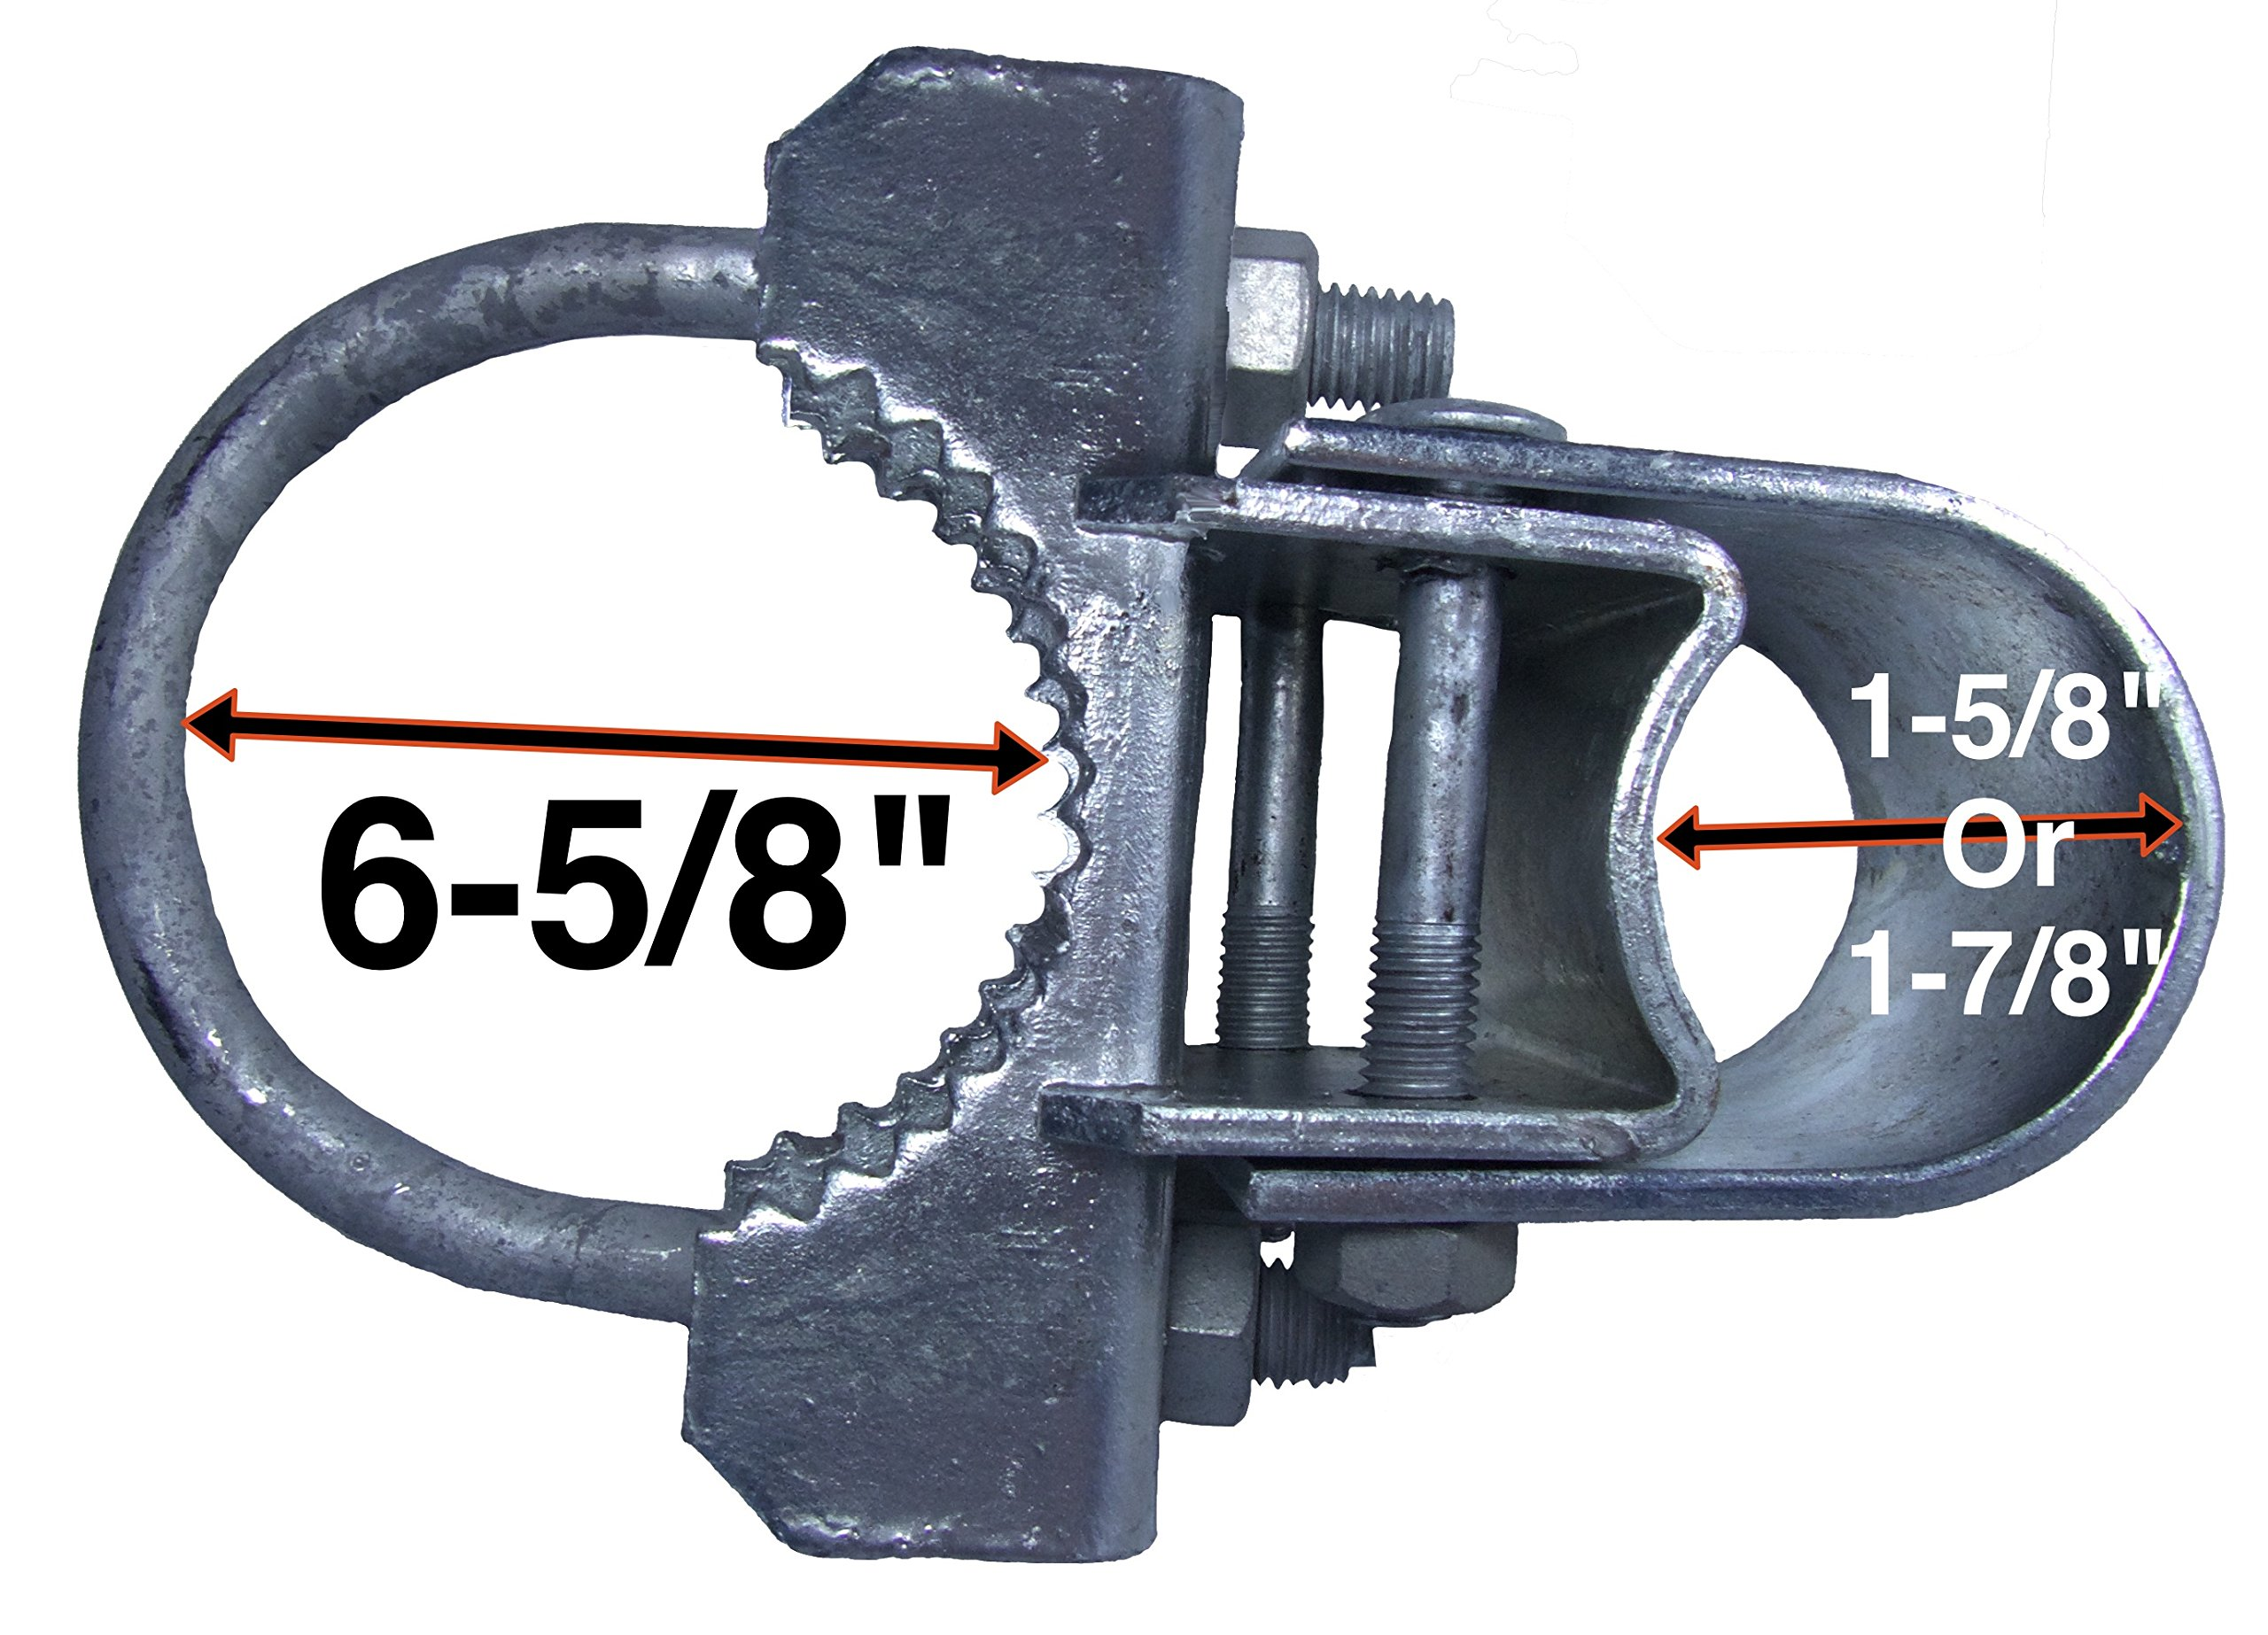 Chain Link Fence ''Bull Dog'' Commercial Duty Gate Hinge - For 6-5/8'' Outside Diameter Gate Post/Pipe & 1-5/8 thru 1-7/8'' Gate Frames - Galvanized Chain Link Post Gate Hinge - Hinge Nuts/Bolts Included by Chain Link Gate Hinge Hardware